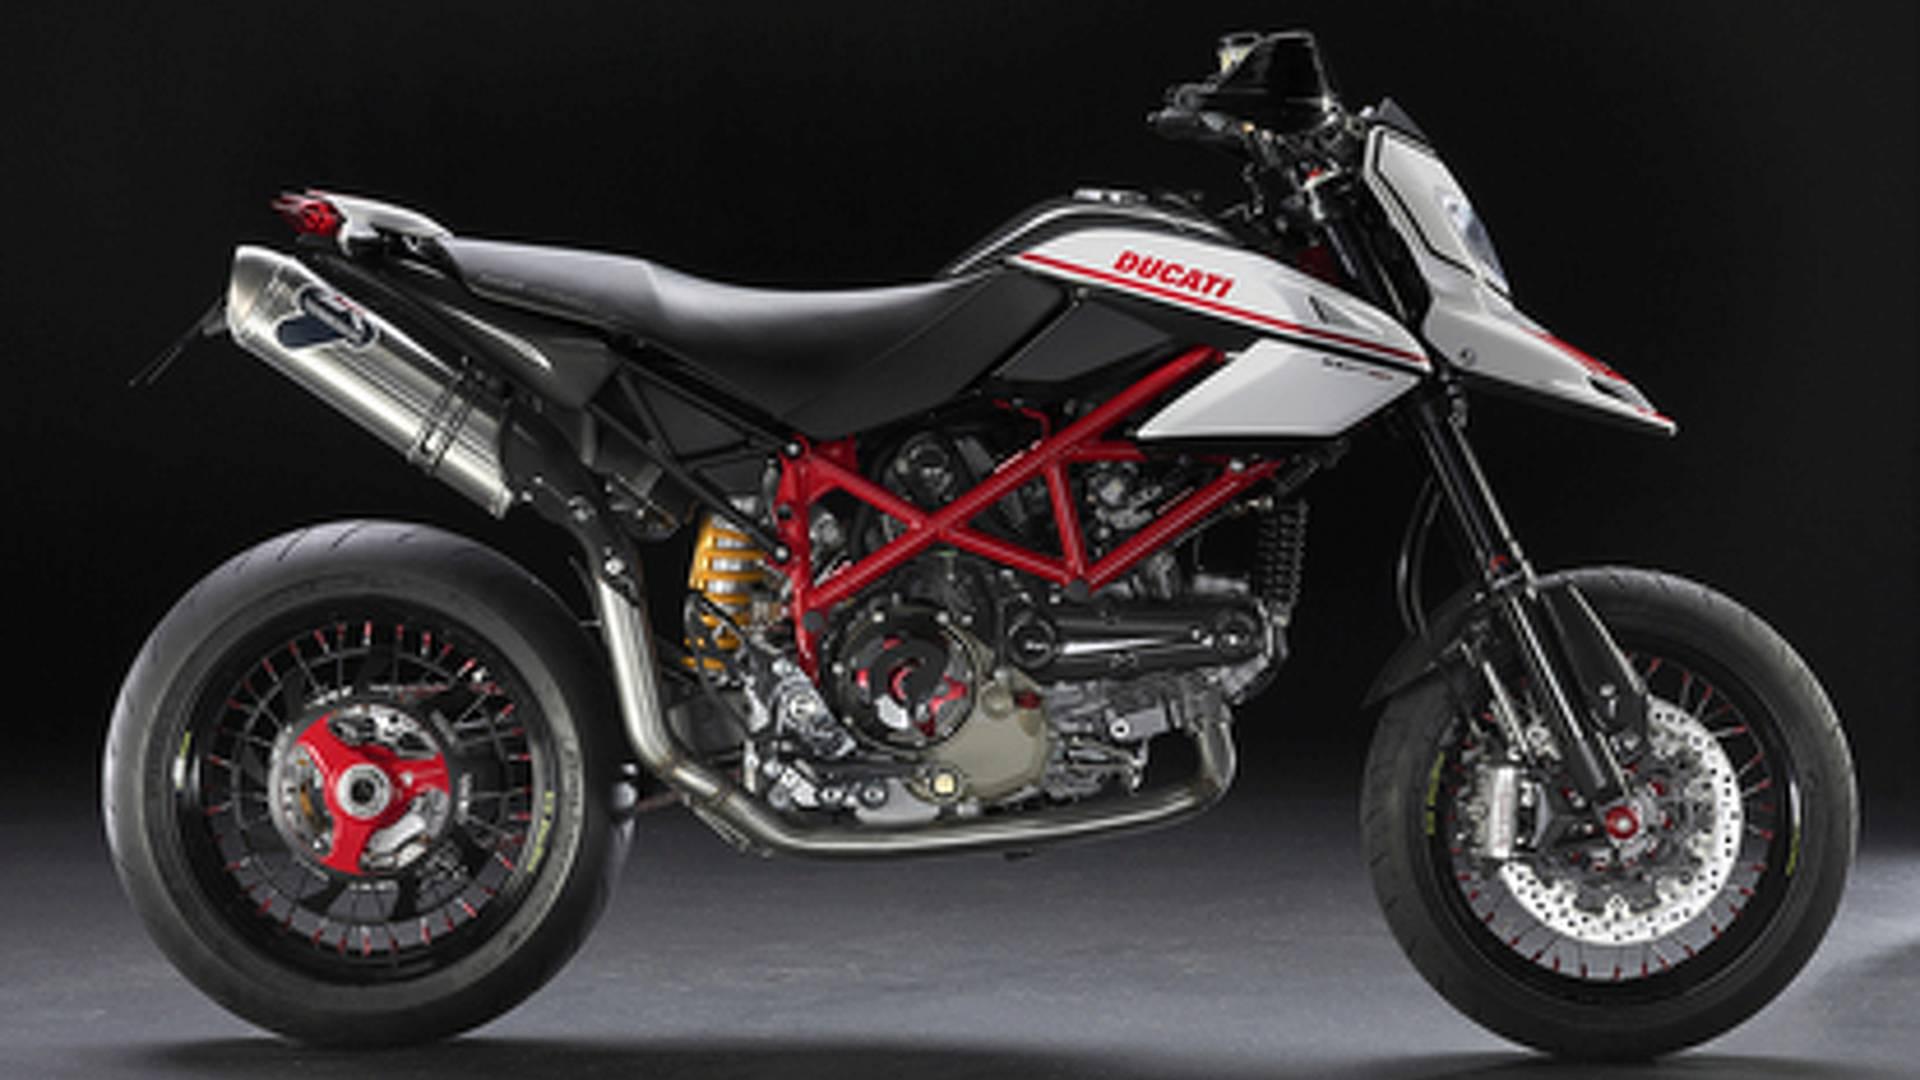 2010 Ducati Hypermotard 1100 Evo Sp Lighter Faster And